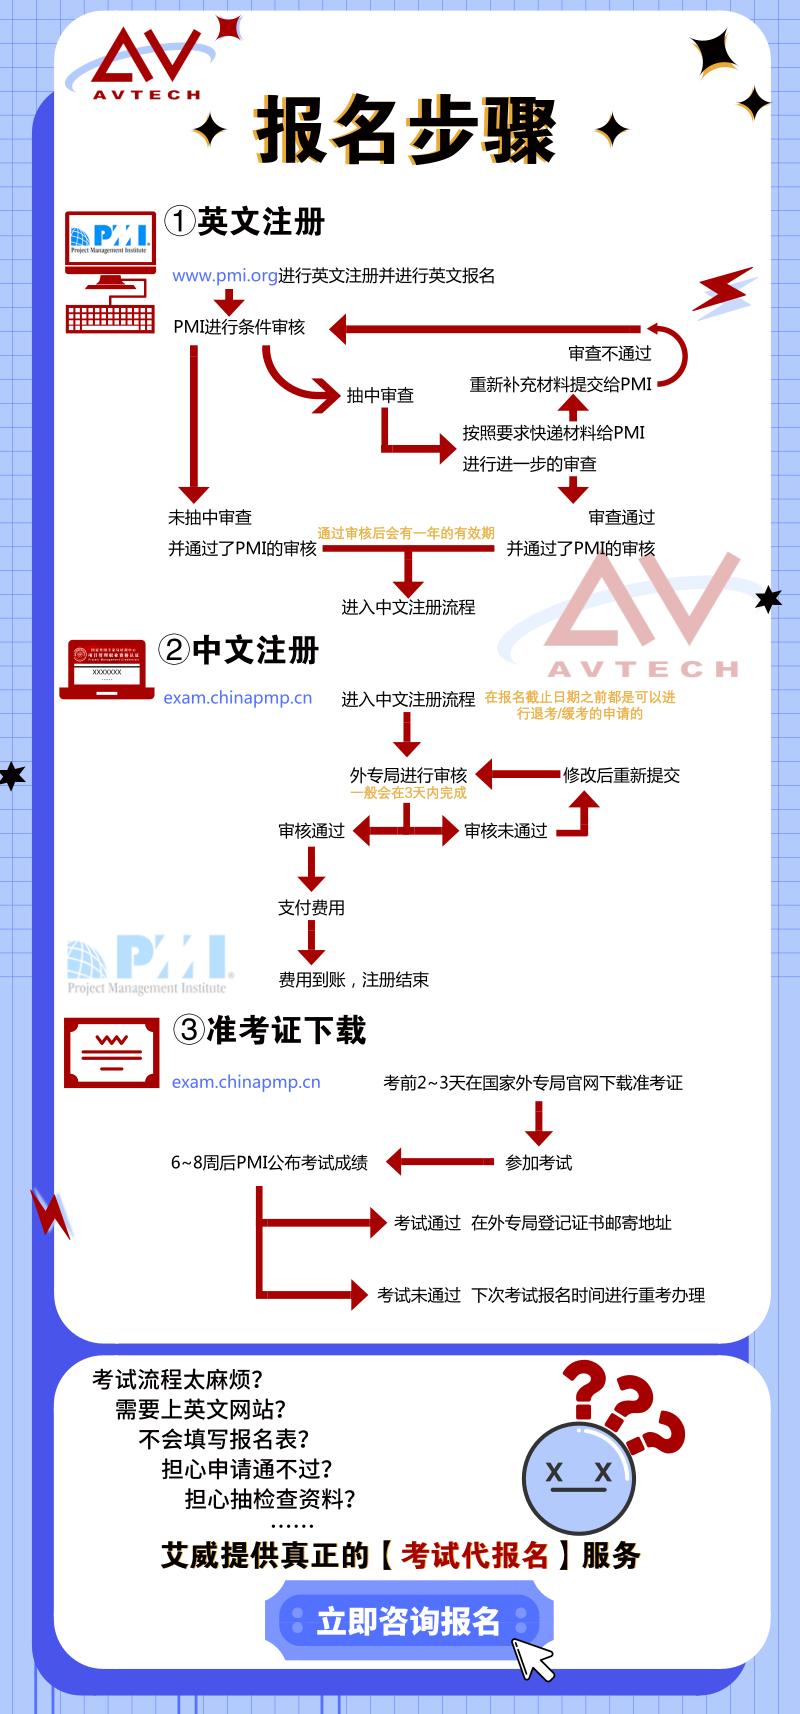 PMP认证流程是怎样的?